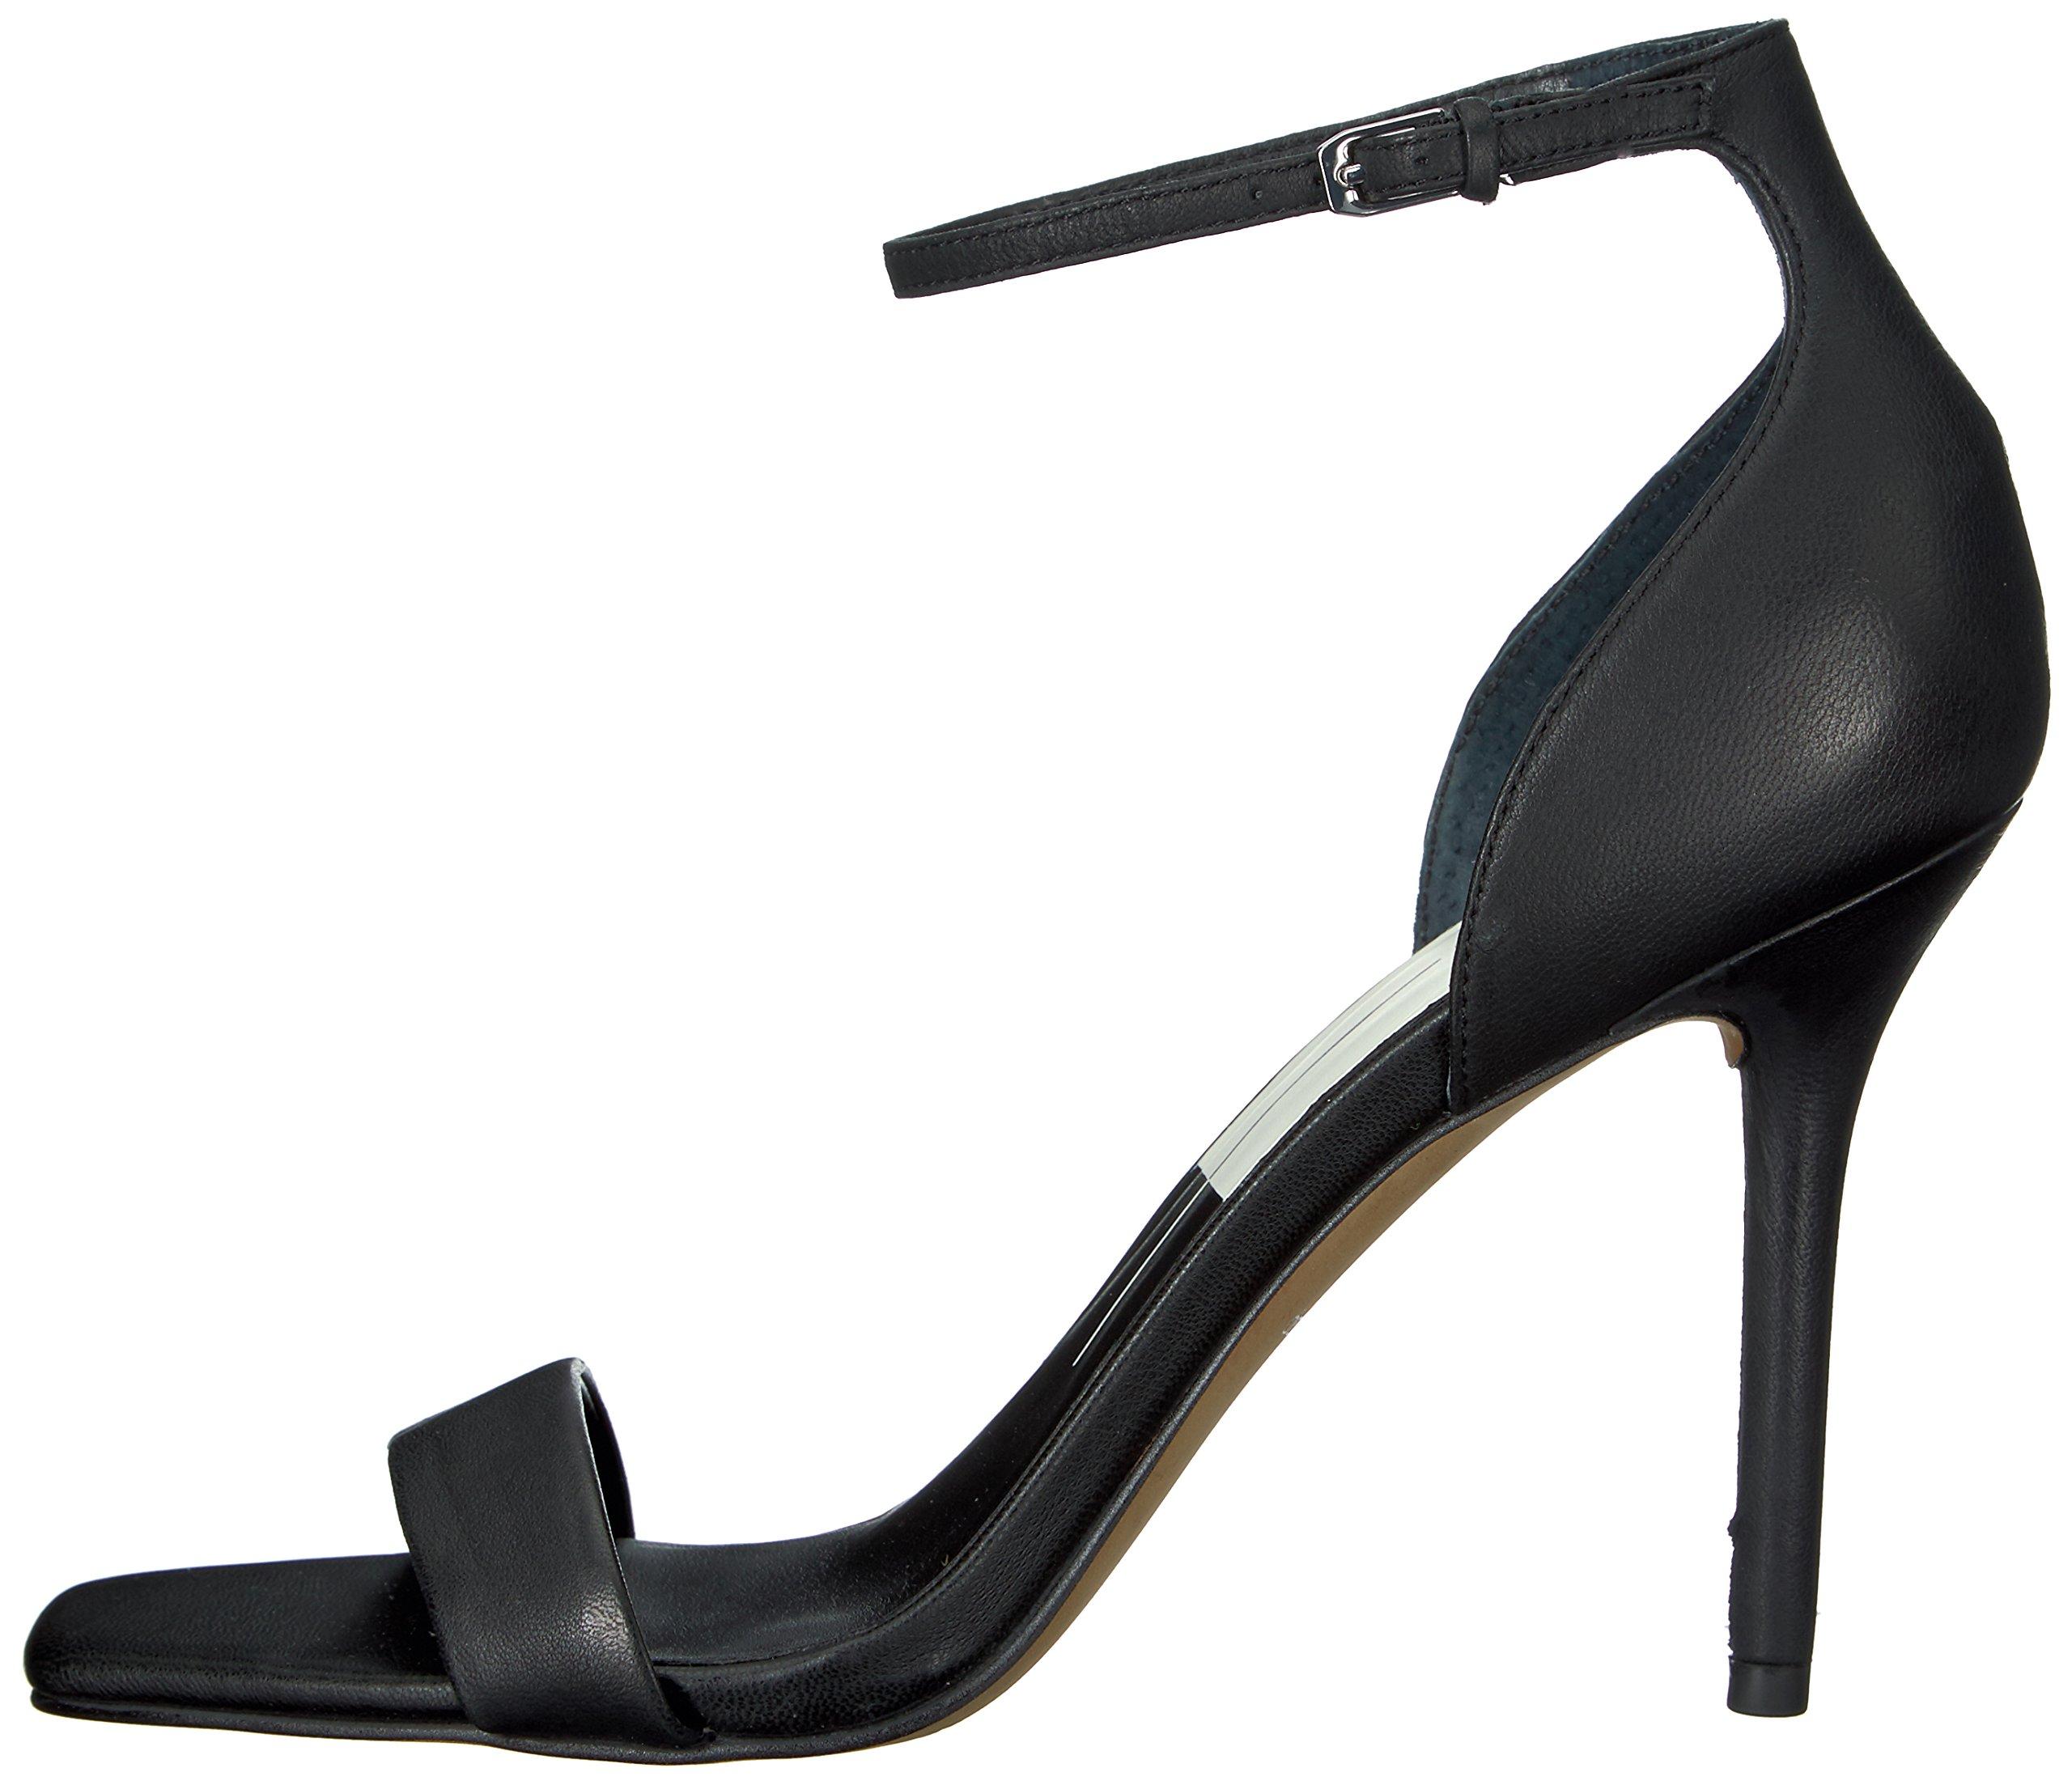 Dolce Vita Women's Halo Heeled Sandal, Black Leather, 8.5 Medium US by Dolce Vita (Image #5)